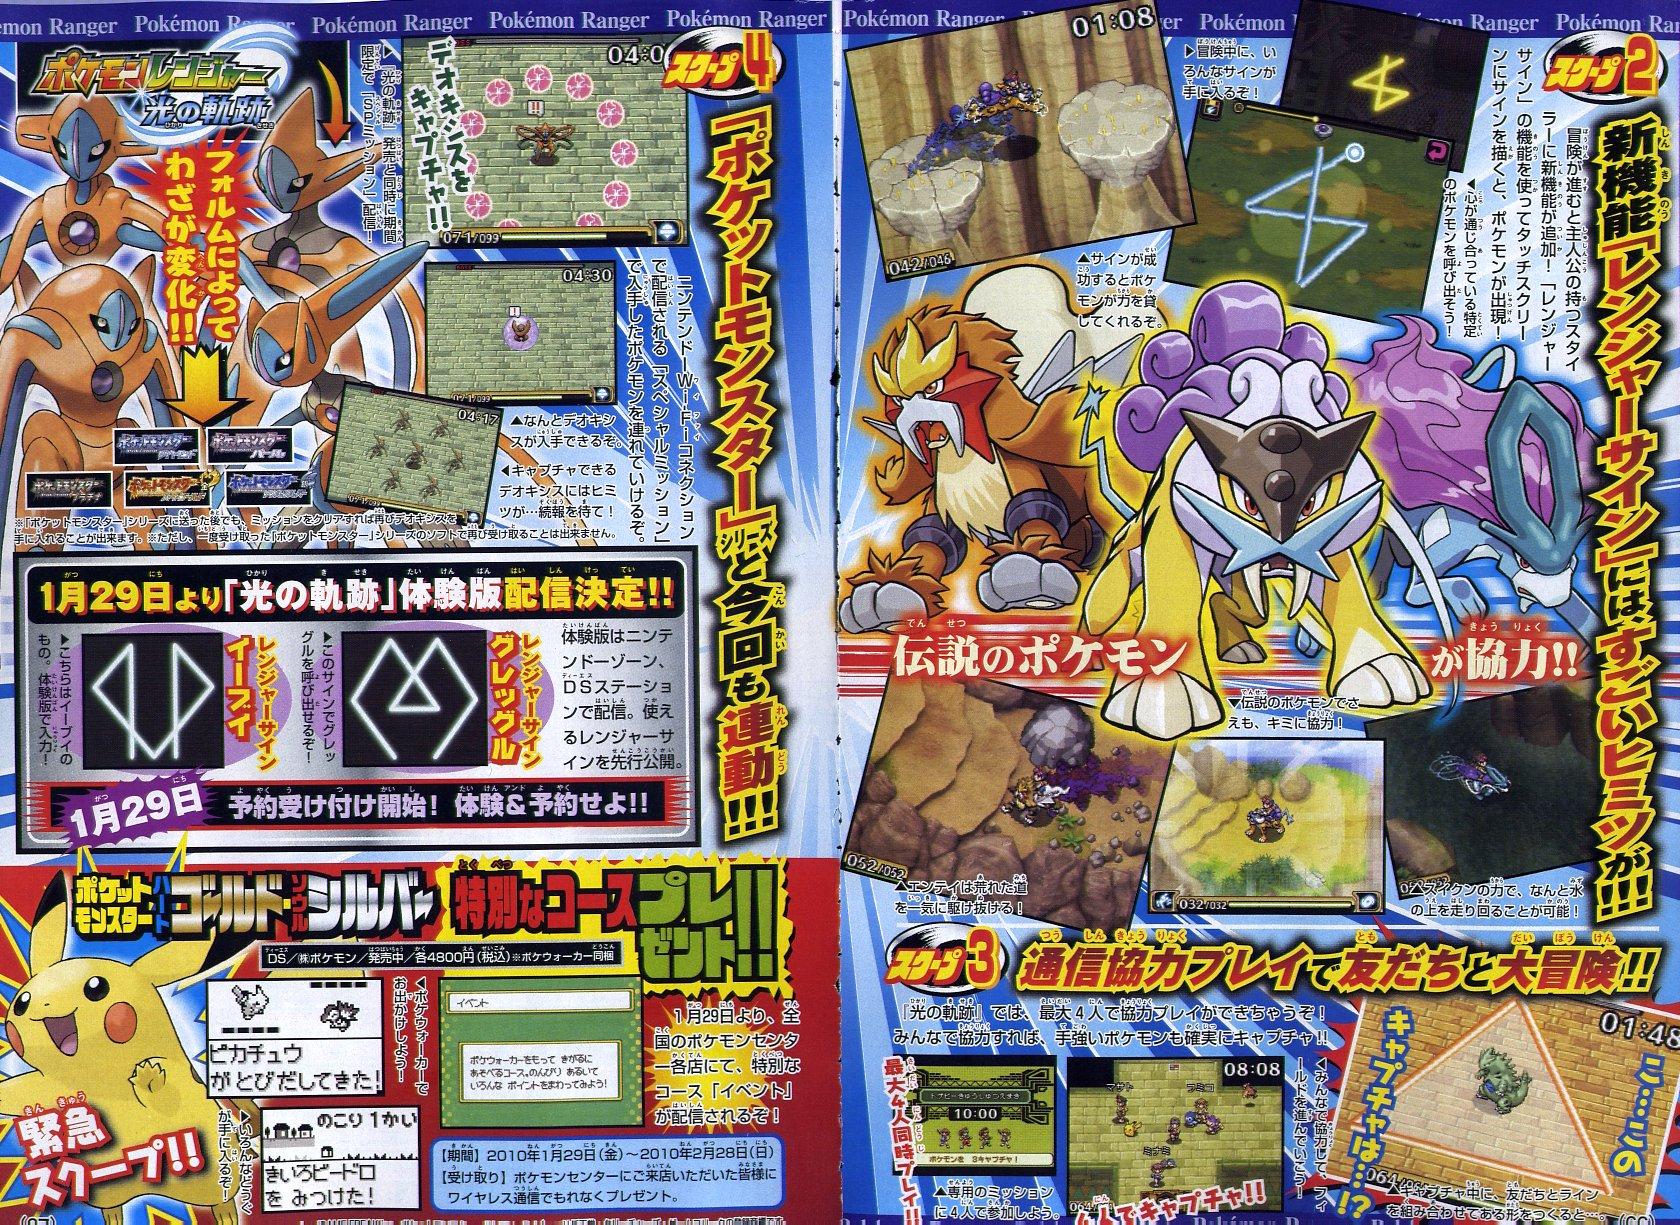 Pokemon ranger tracks of light to be released in japan march 6 the latest issue of corocoro magazine has revealed a new pokemon ranger game subtitled tracks of light aloadofball Gallery